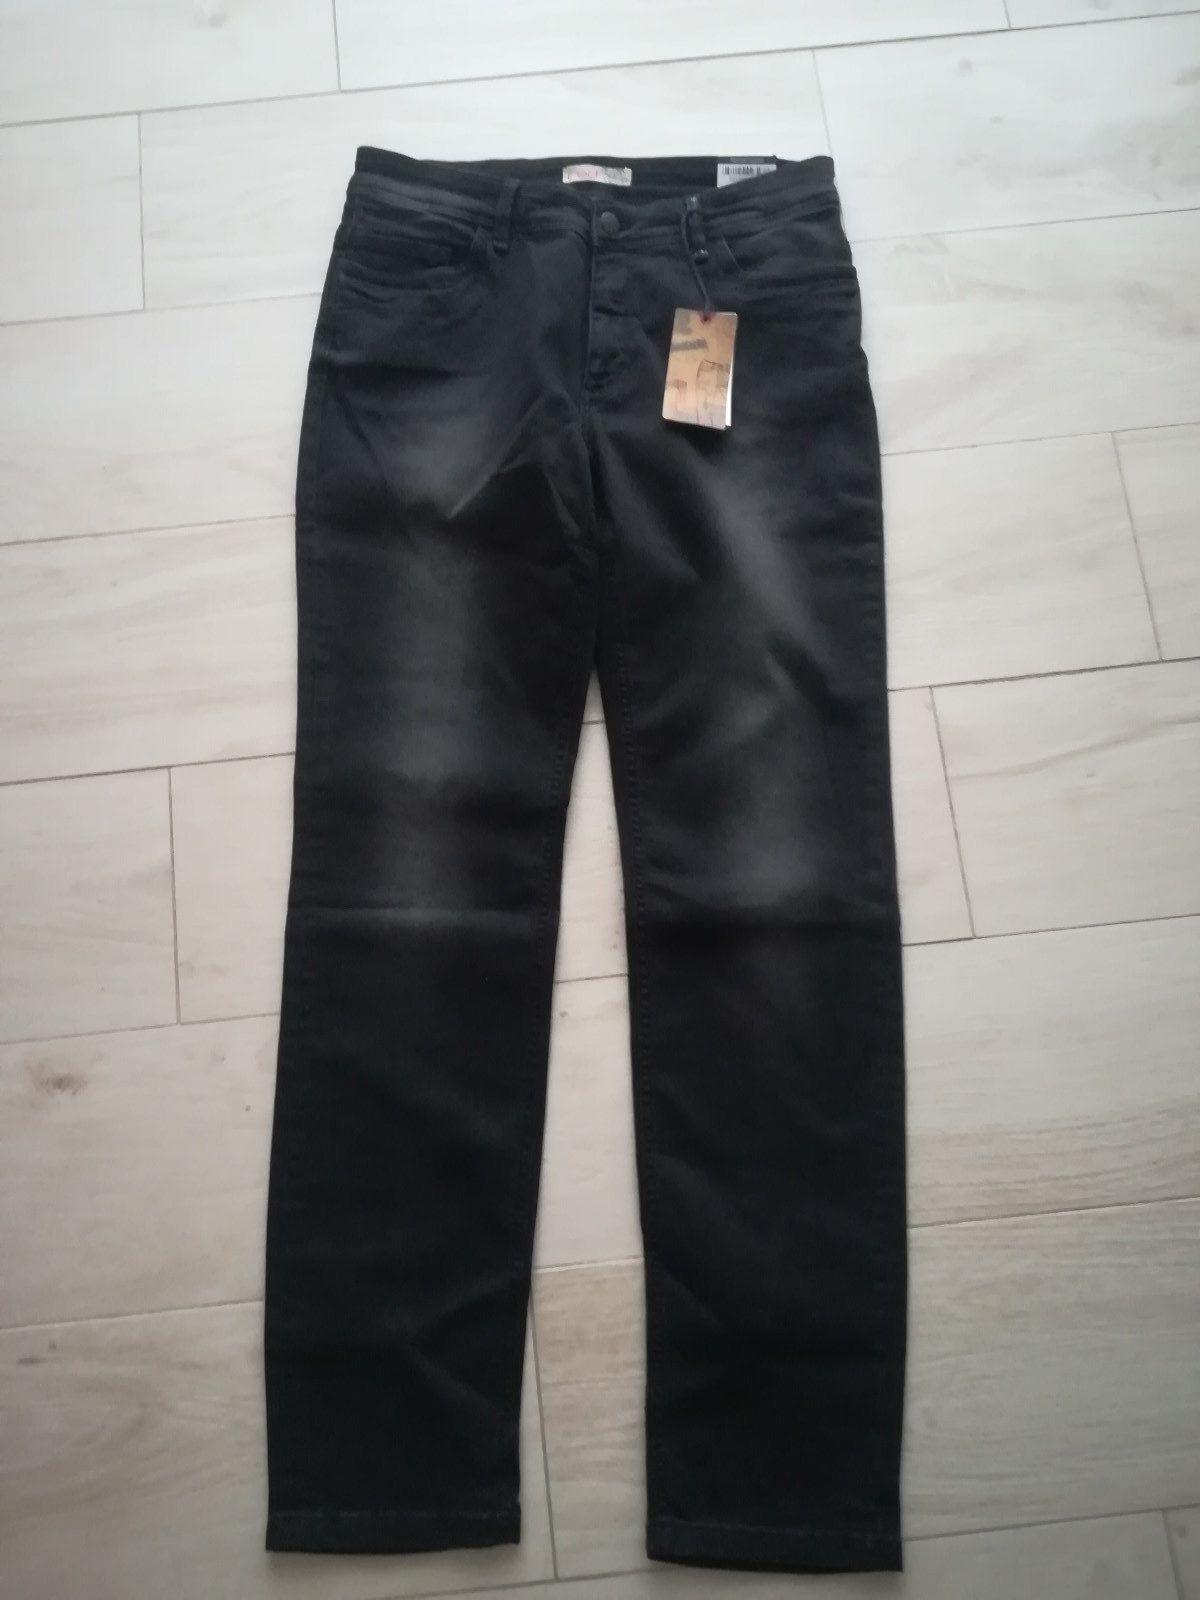 TONI rot Jeans Hose schwarz Gr. 42 regular NEU NP   Modell 1121-22